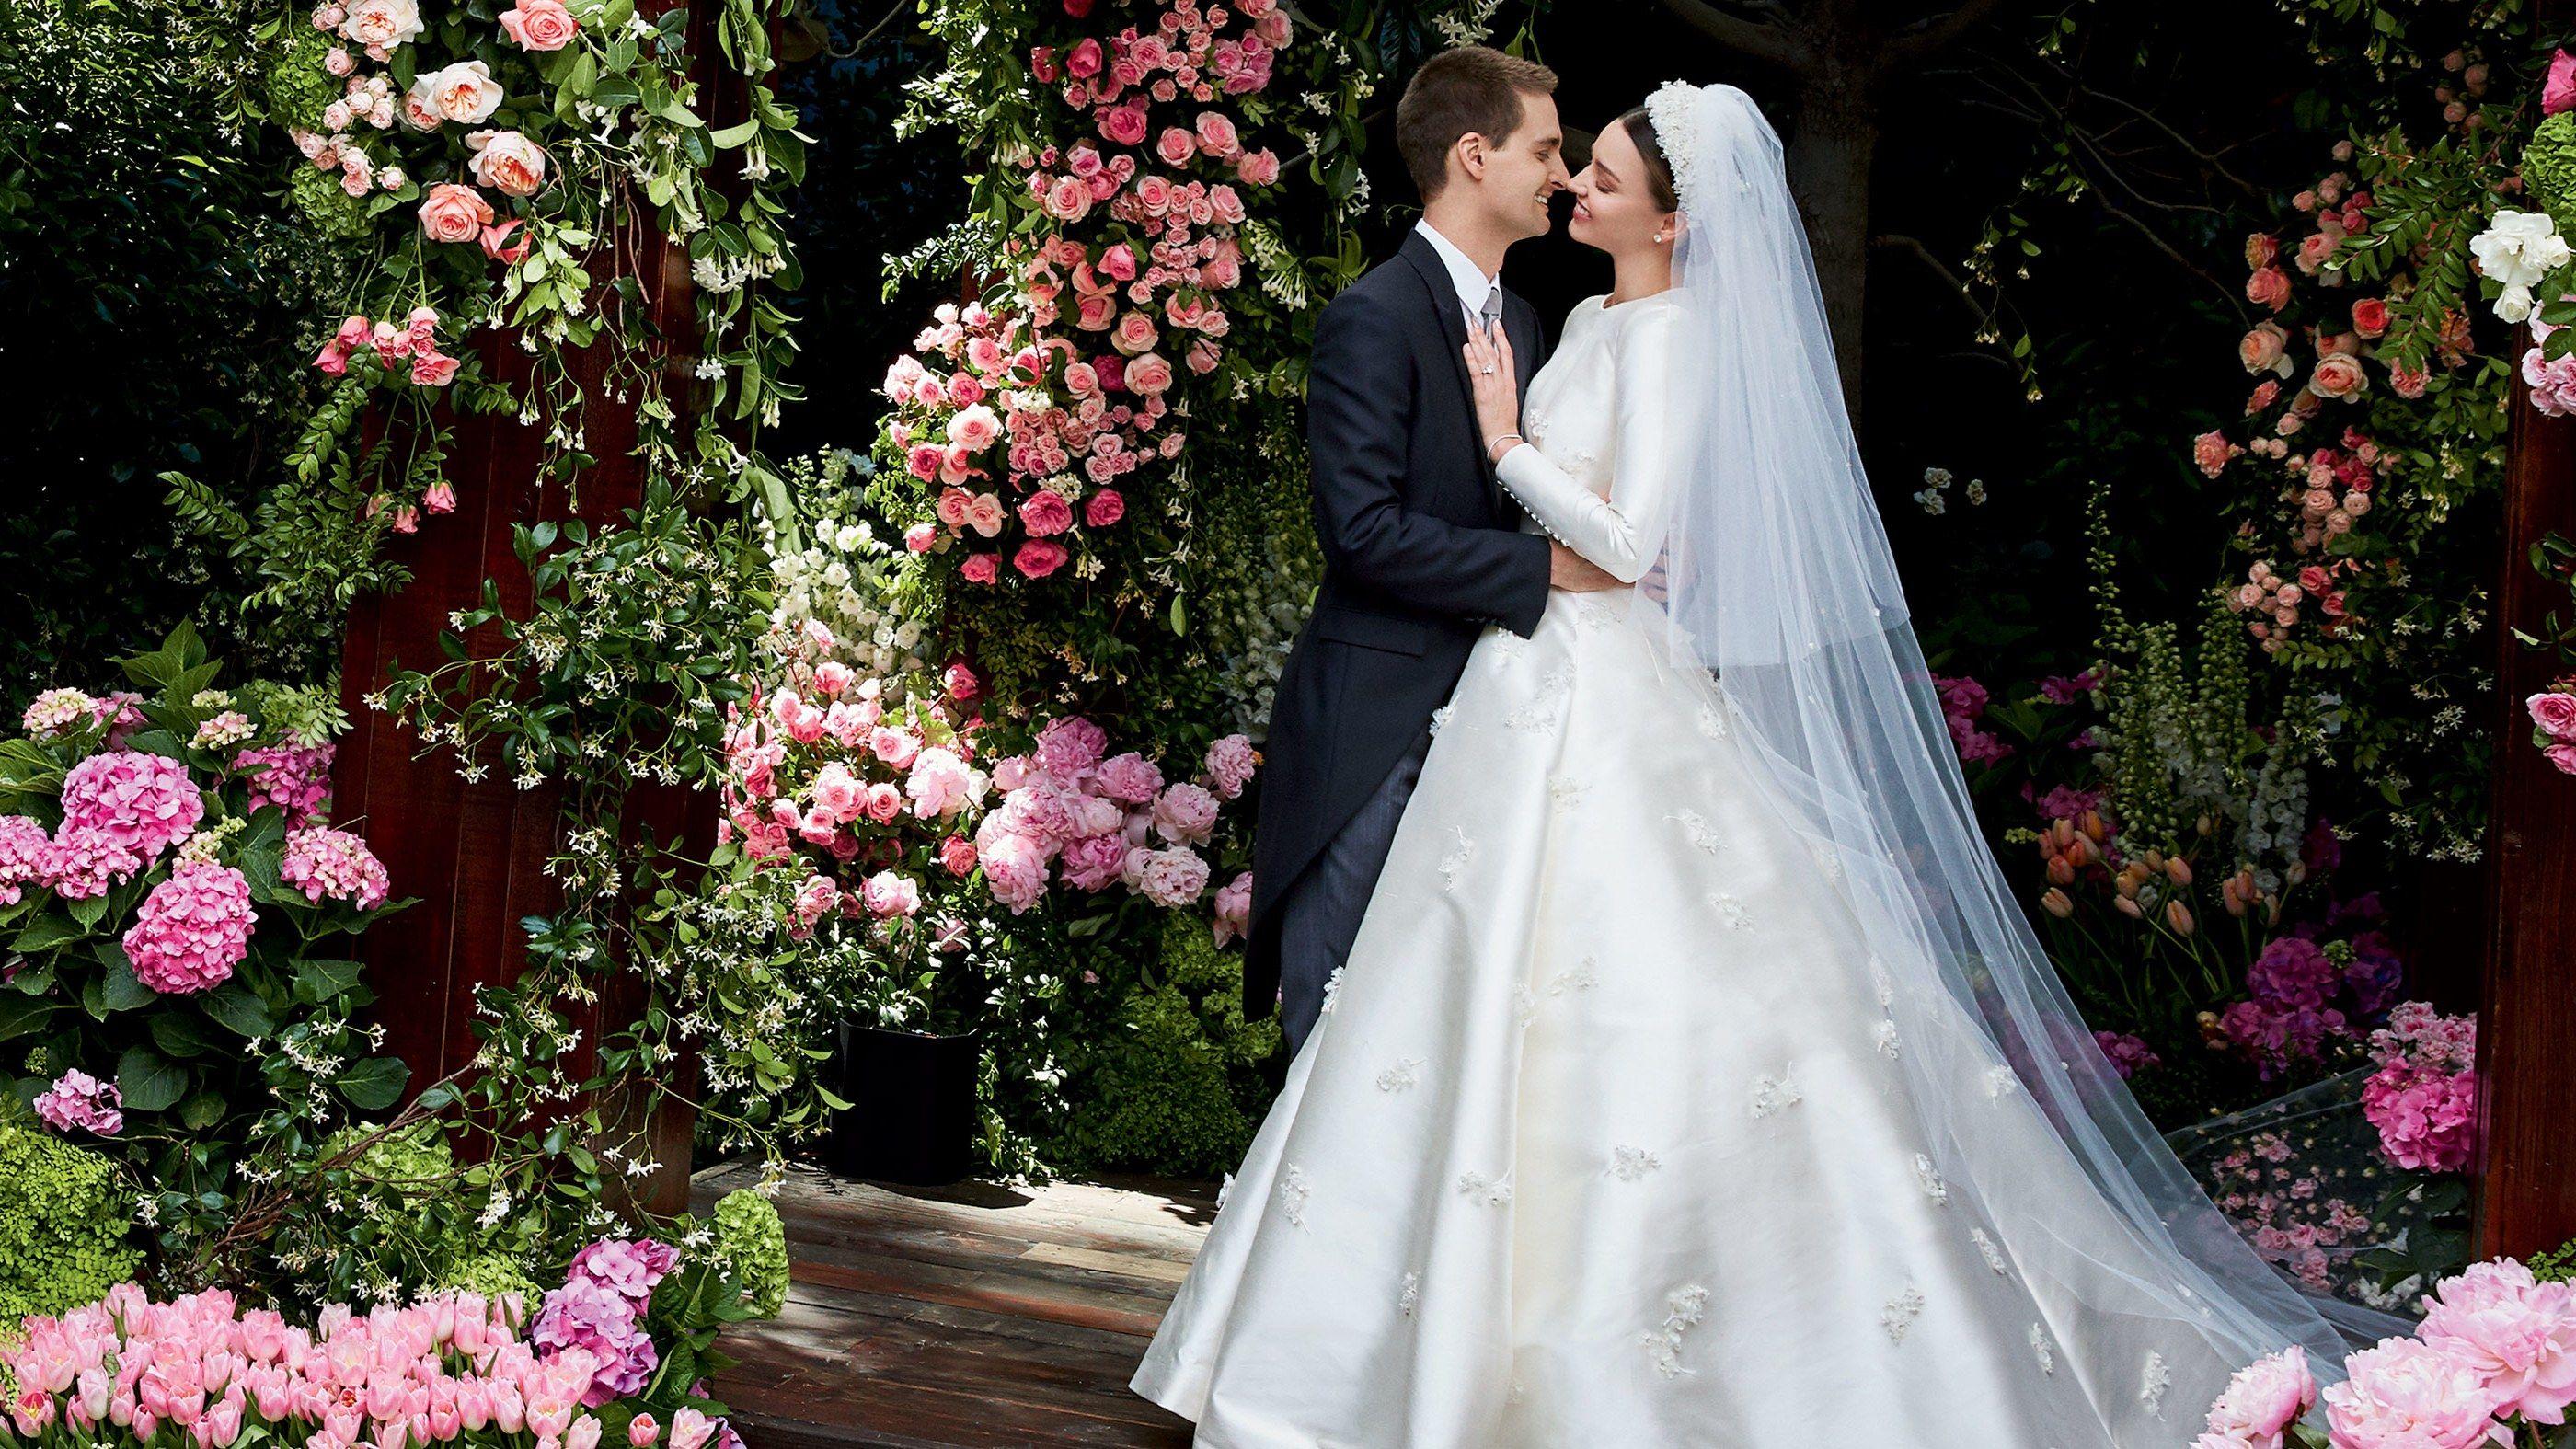 Dior wedding dresses  Miranda Kerrus Wedding Dress An Exclusive Look at Her Custom Dior